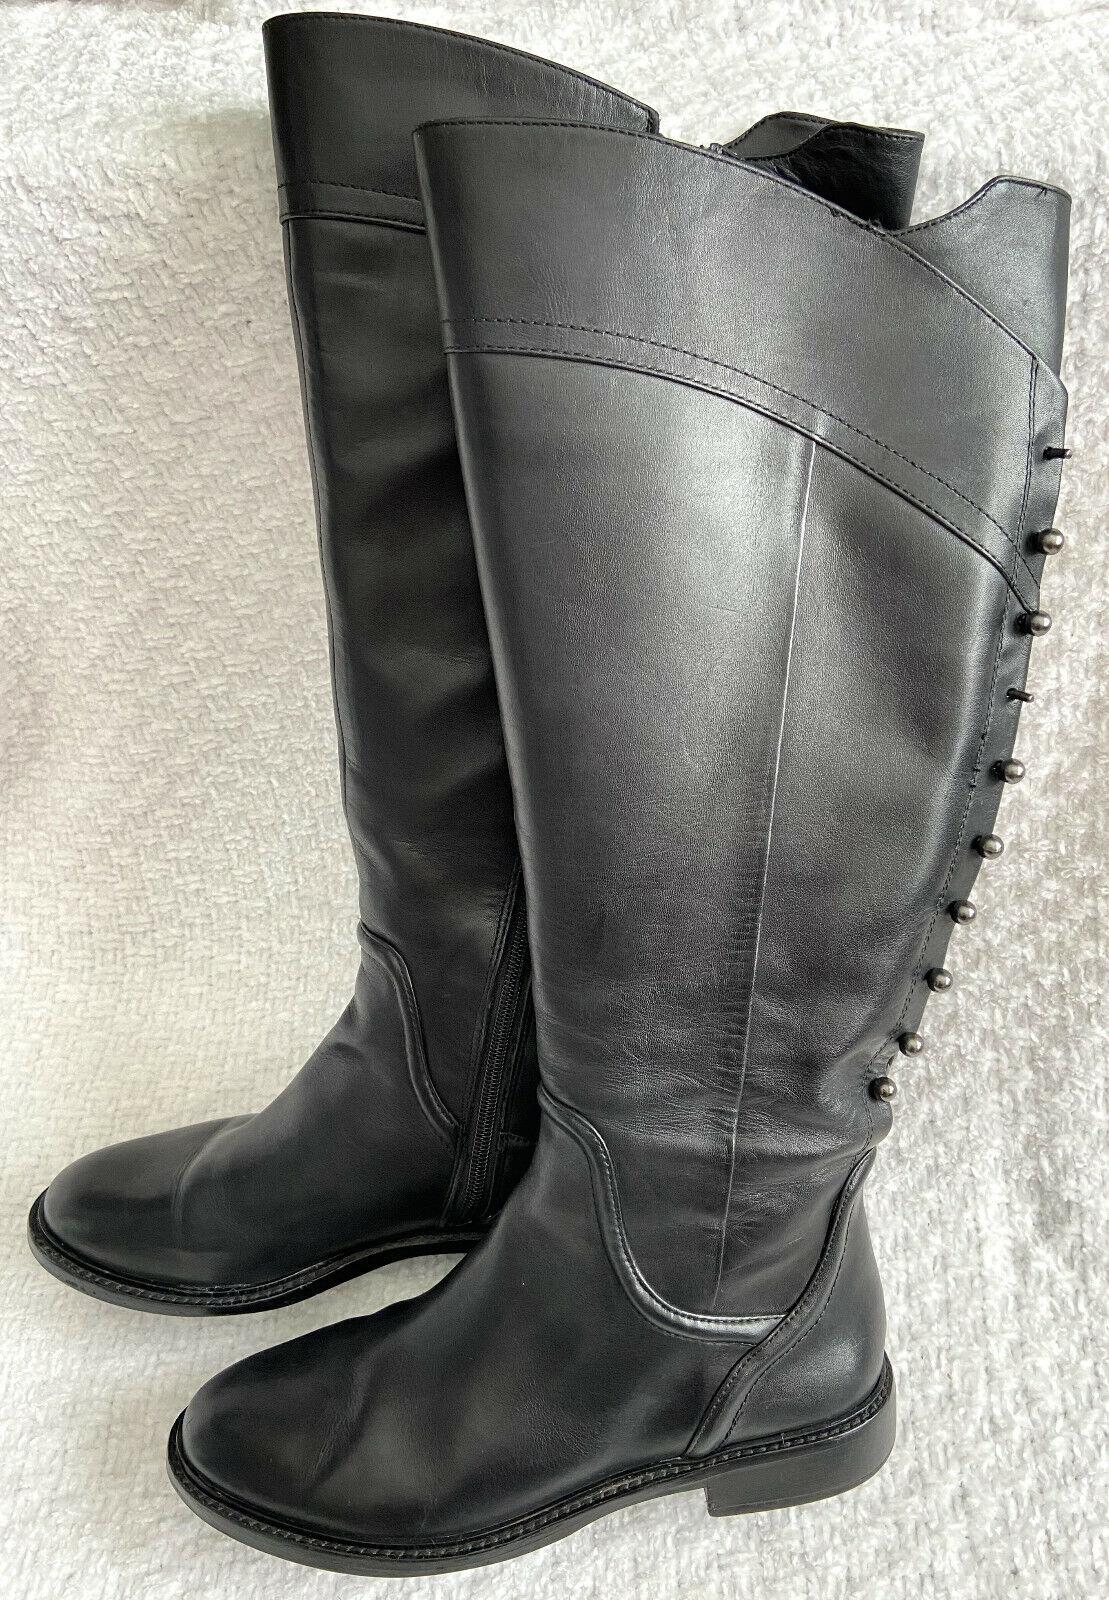 GIANNI BIDI Tall Black Leather Boots Women's 7.5 MW Metal Studs Riding Side Zip